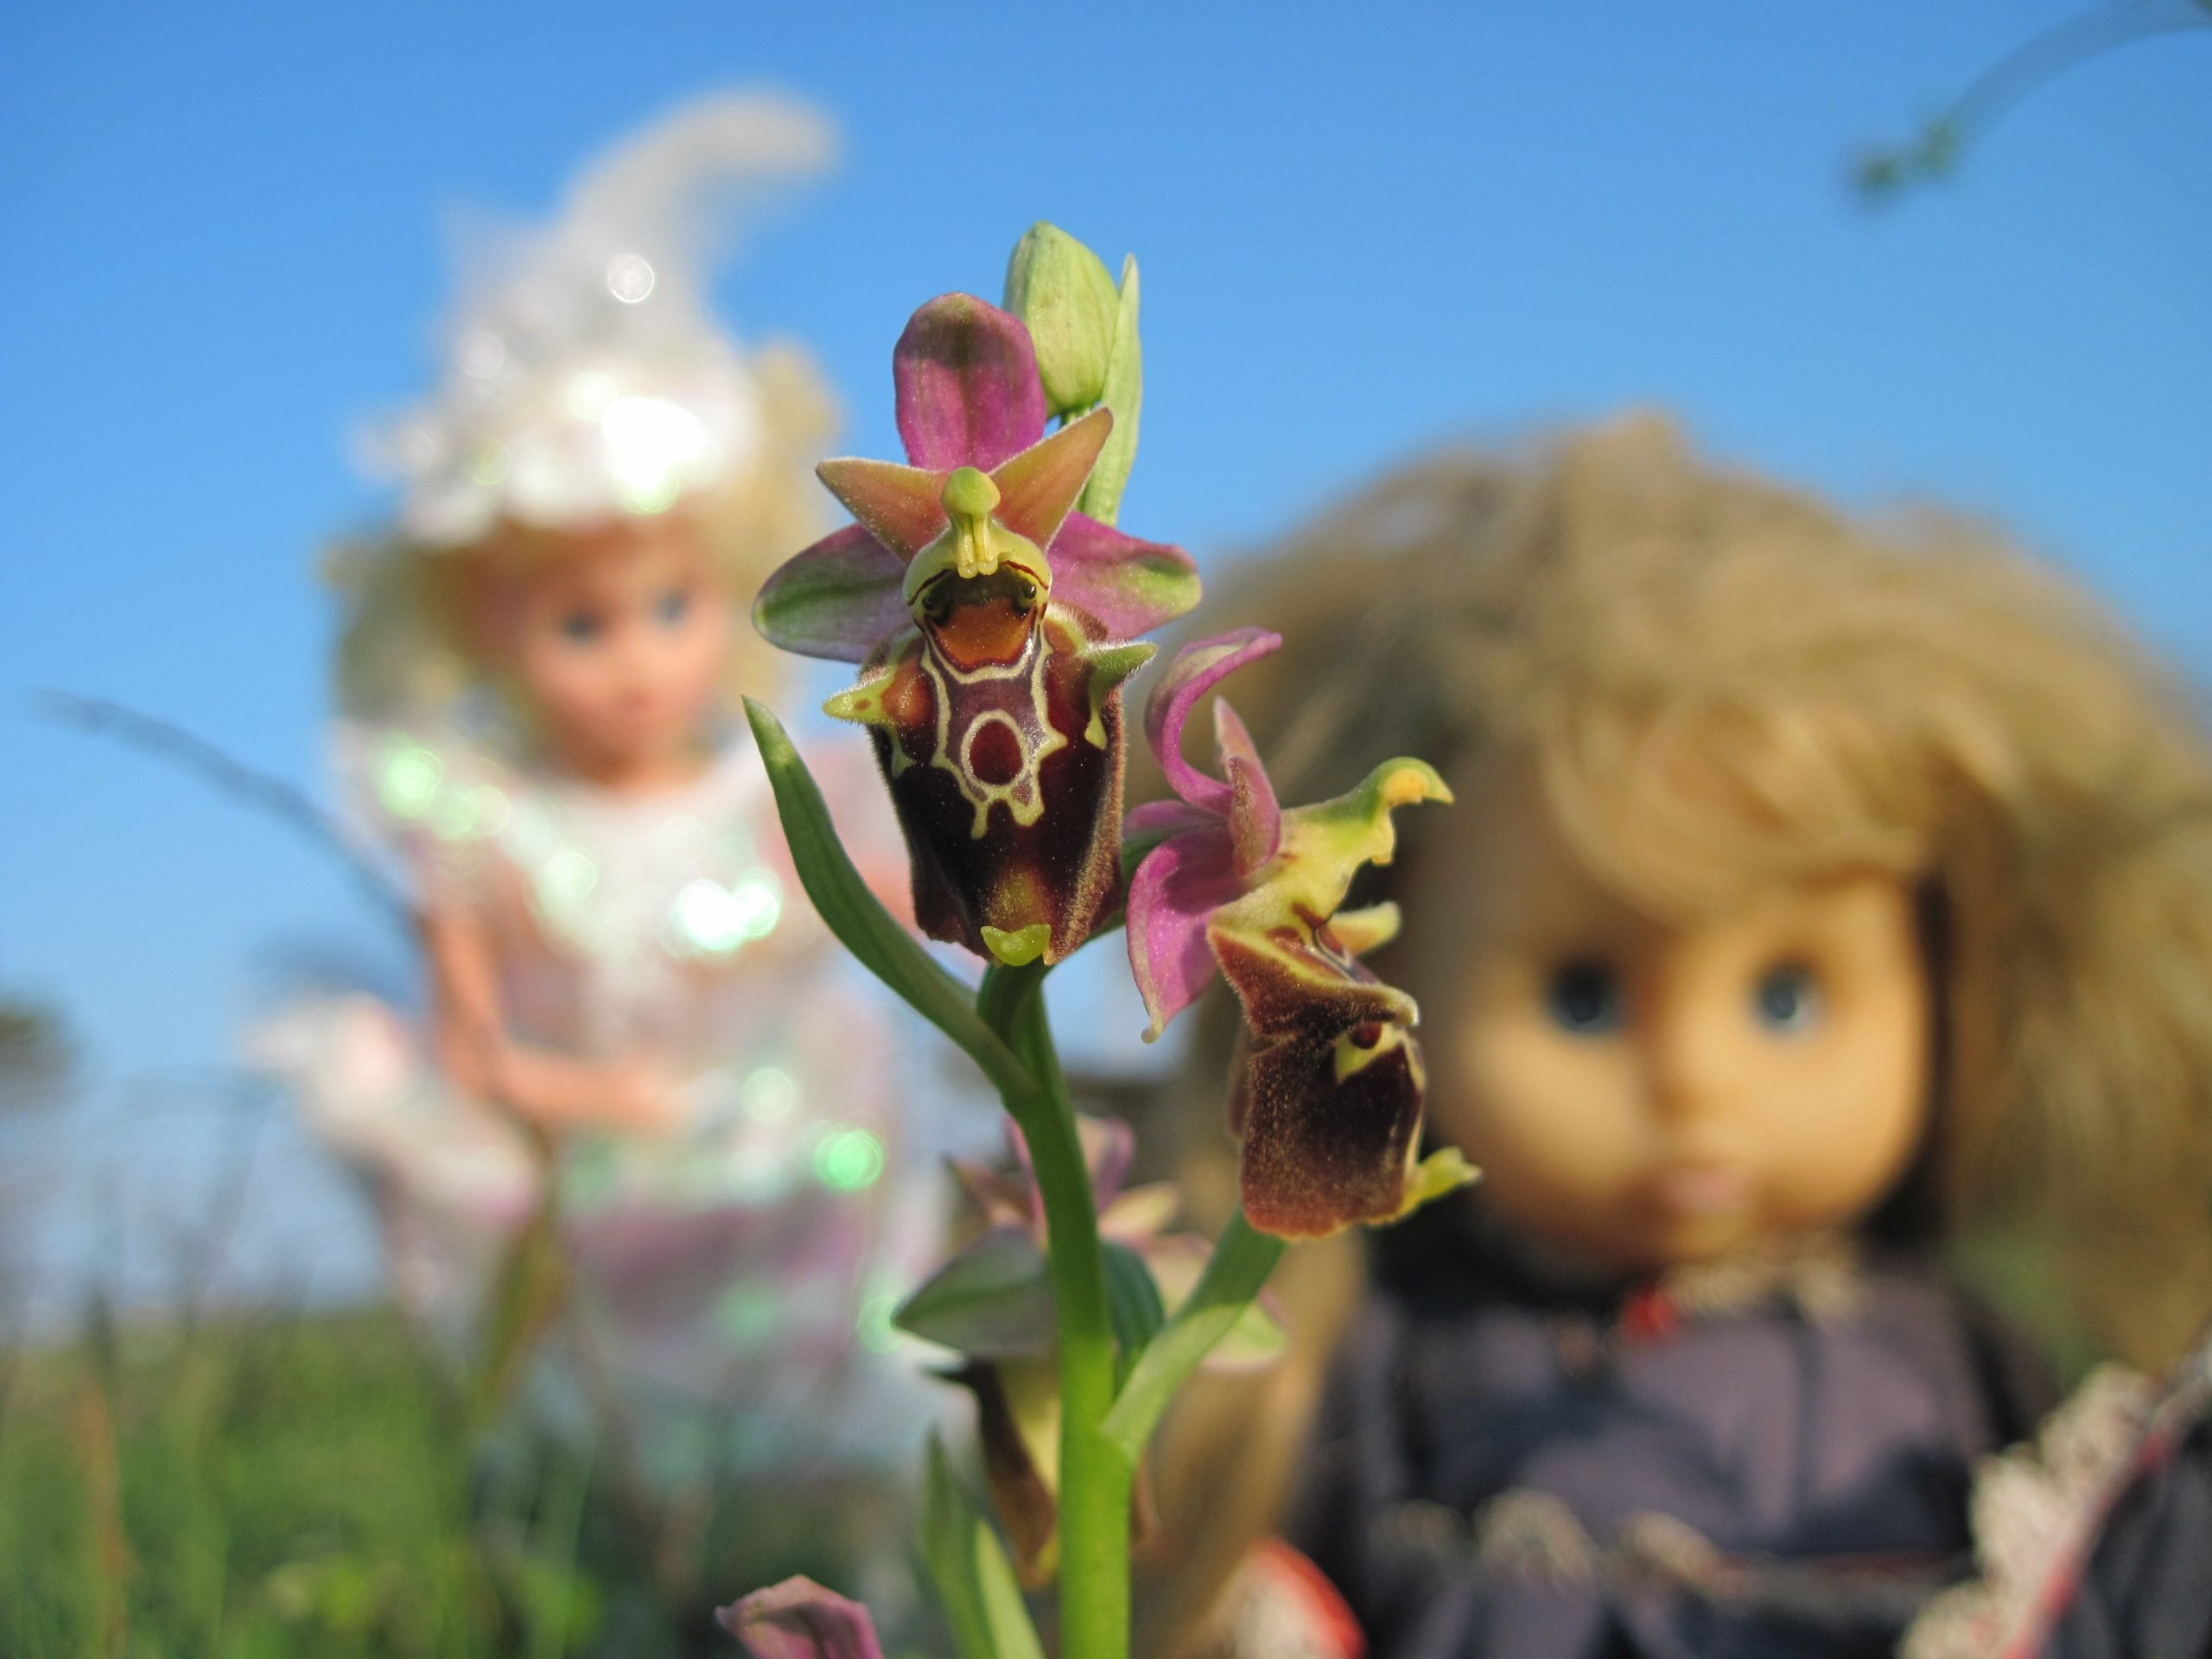 Ophrys-apulica-salento-kaliani-trip